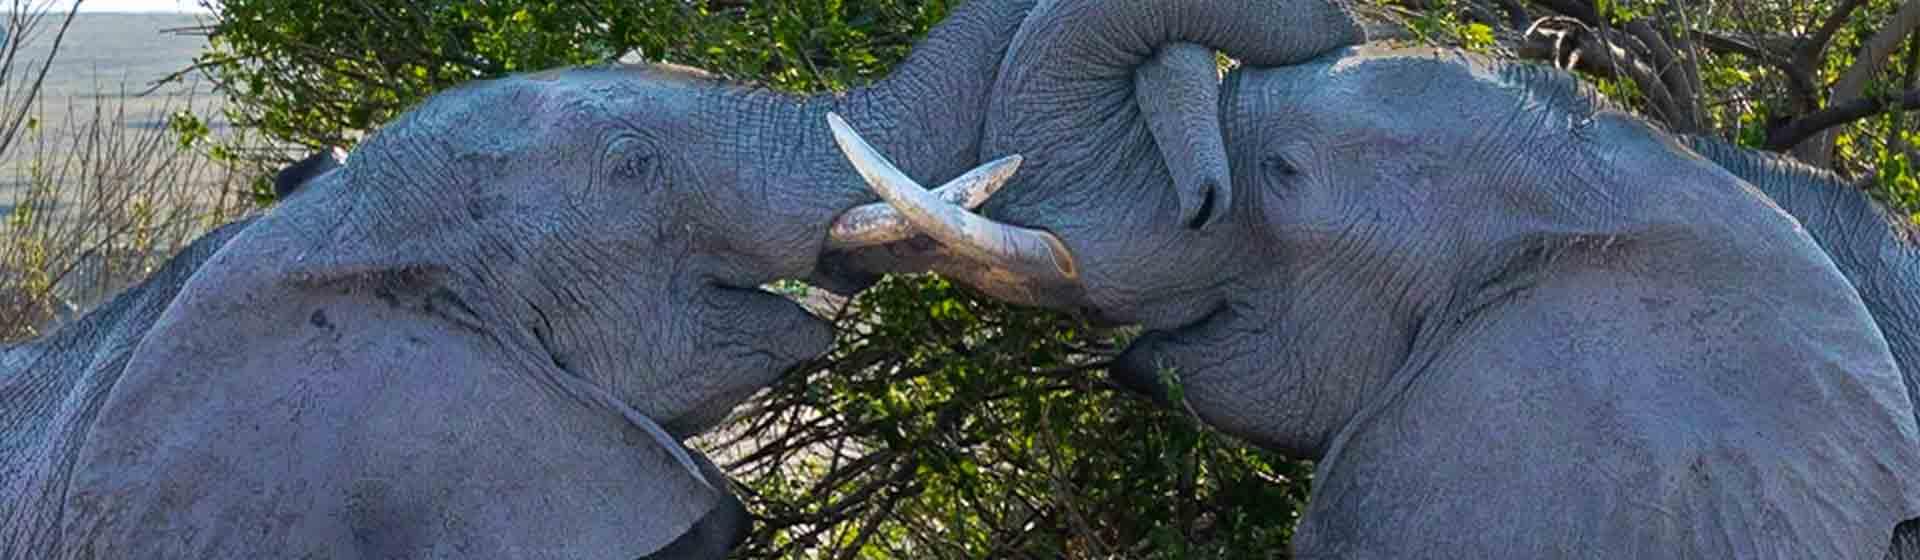 tsavo national game park elephant herds | Discover Kenya wildlife Tour